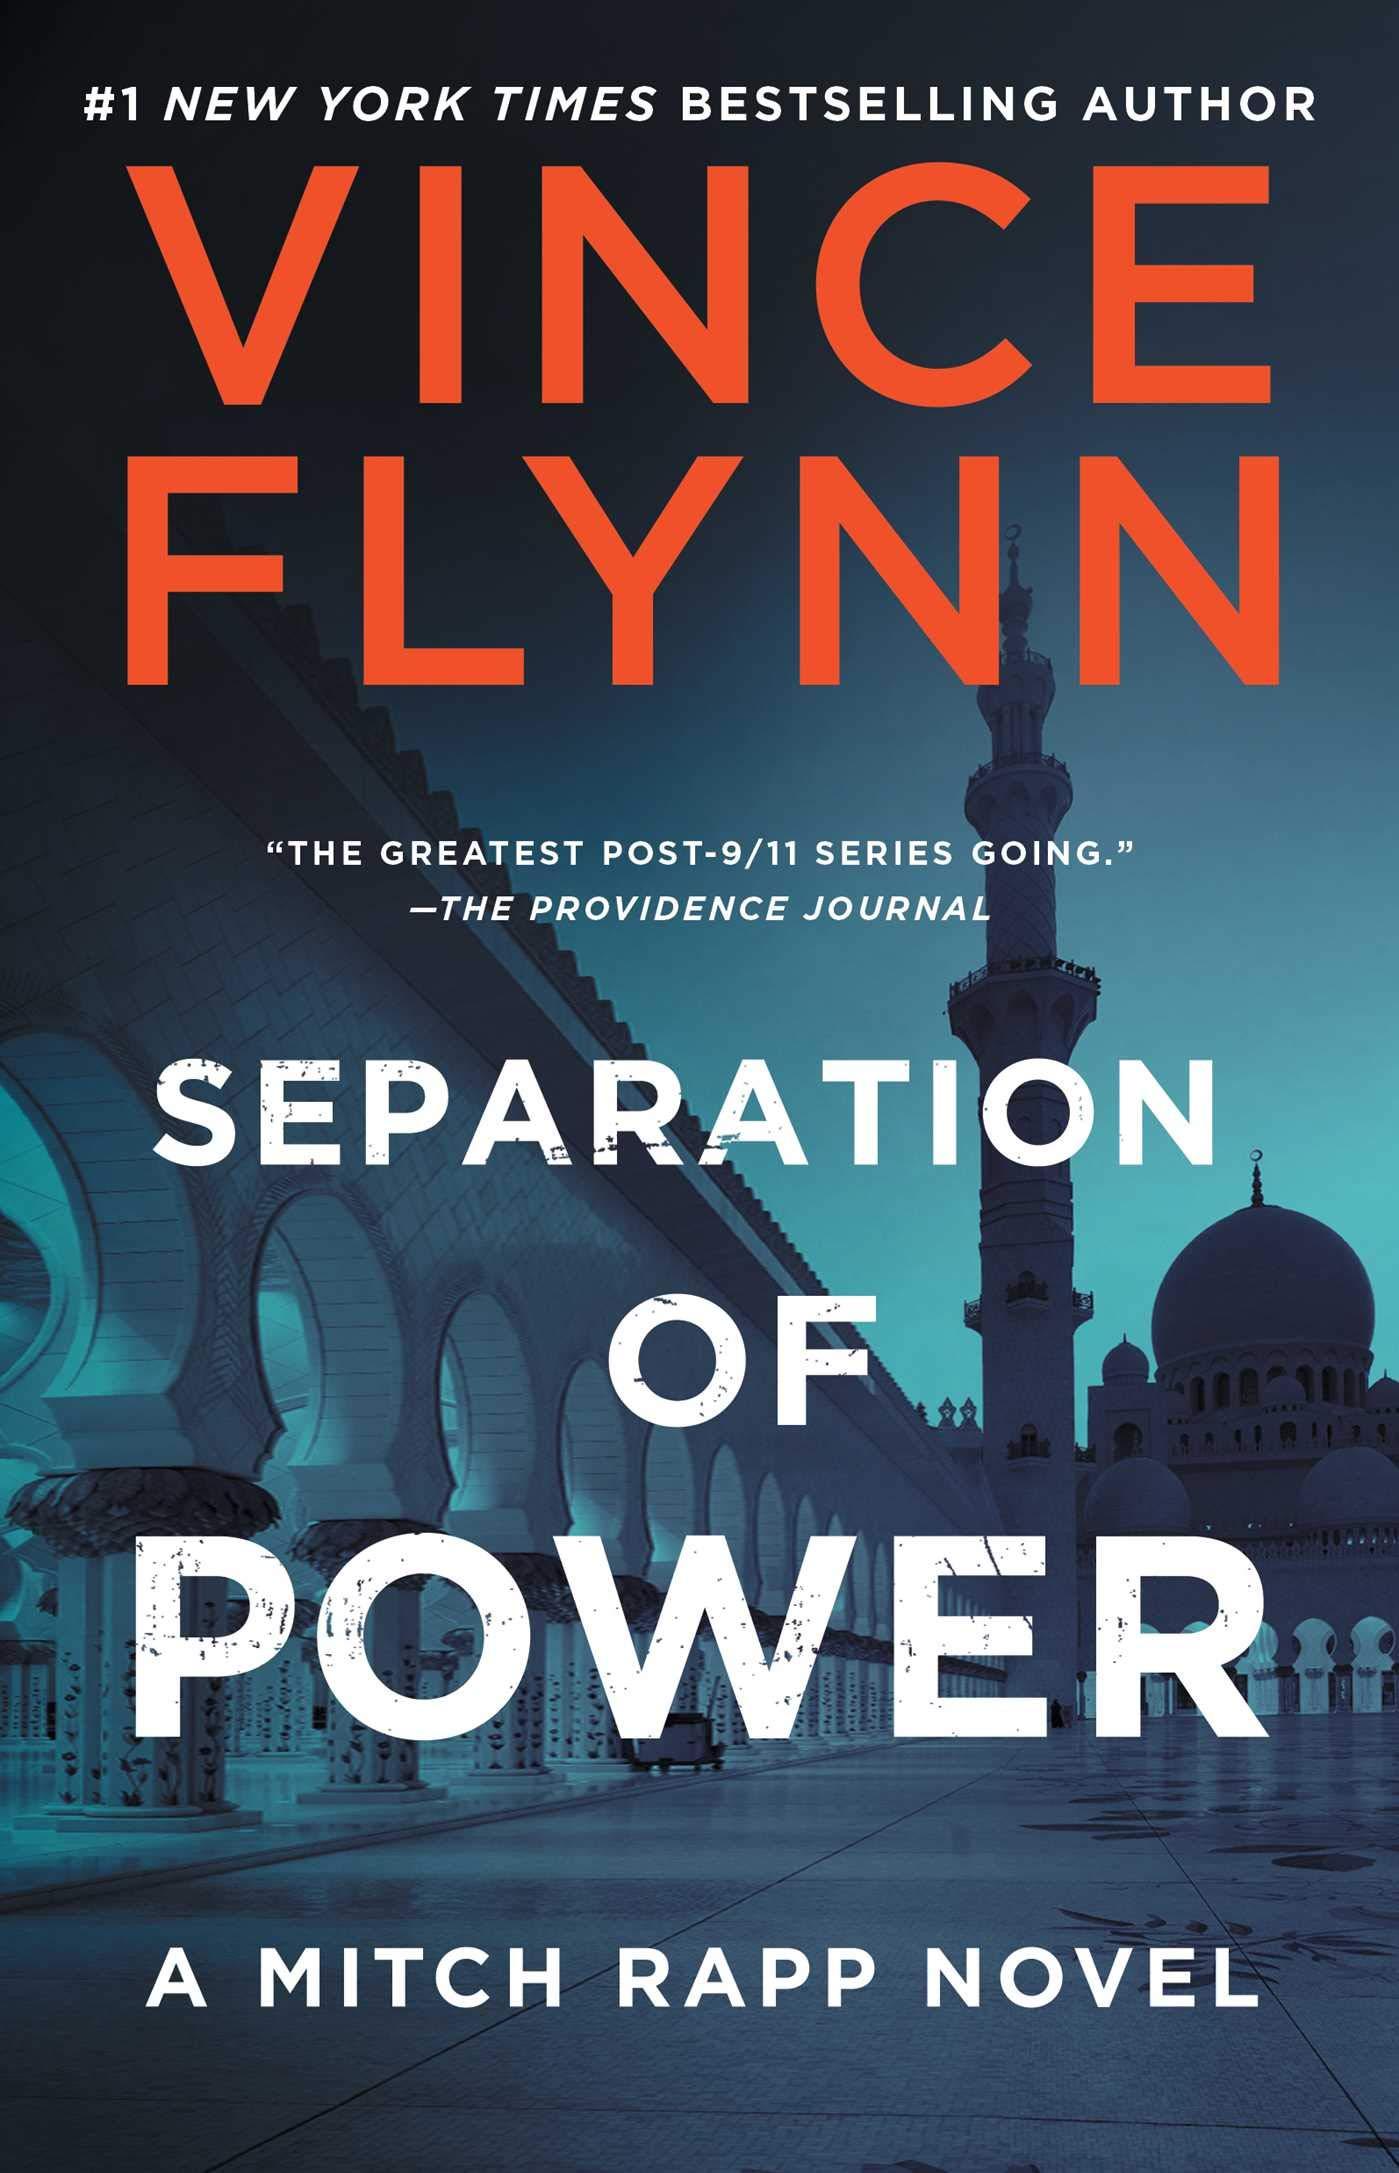 Separation of Power (A Mitch Rapp Novel Book 3)